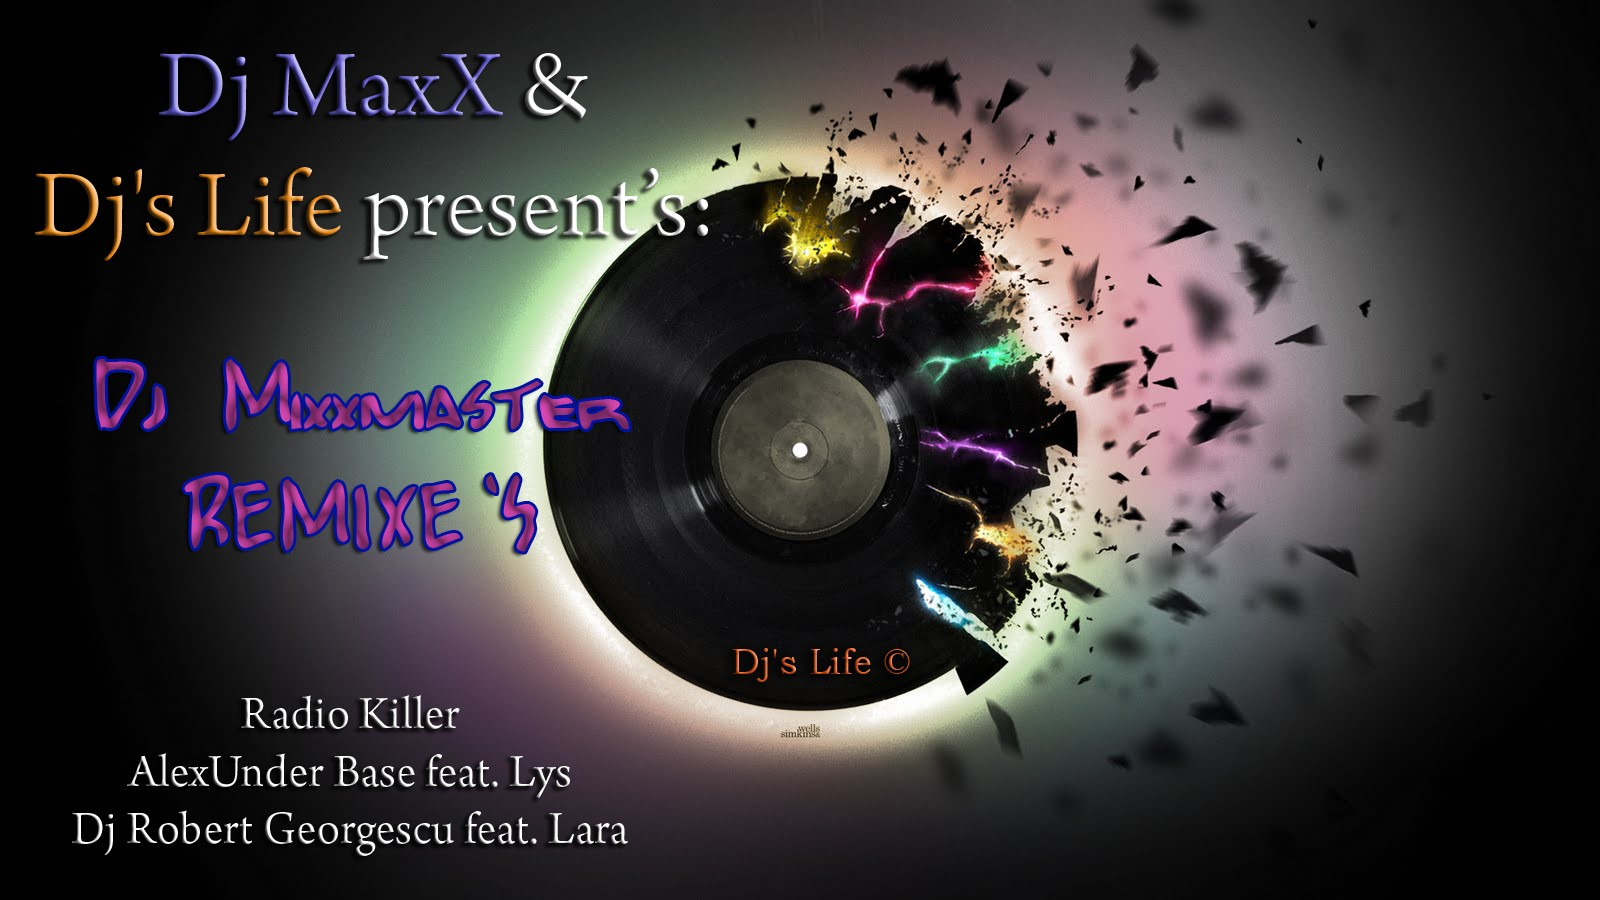 Dj MaxX present: Dj Mixxmaster Remixes